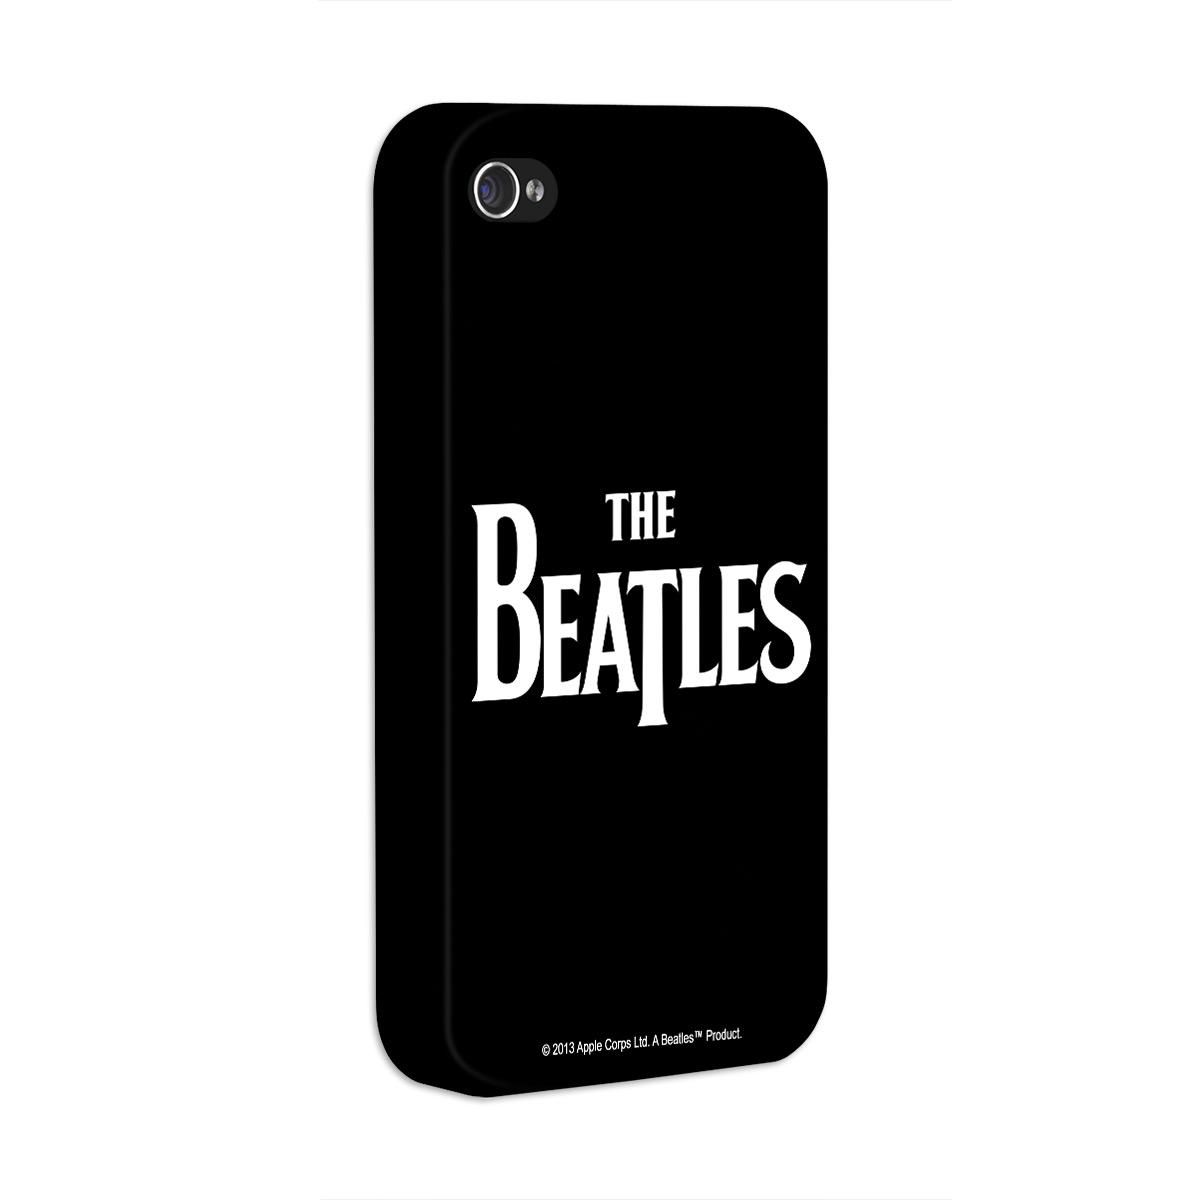 Capa de iPhone 4/4S The Beatles Classic Logo